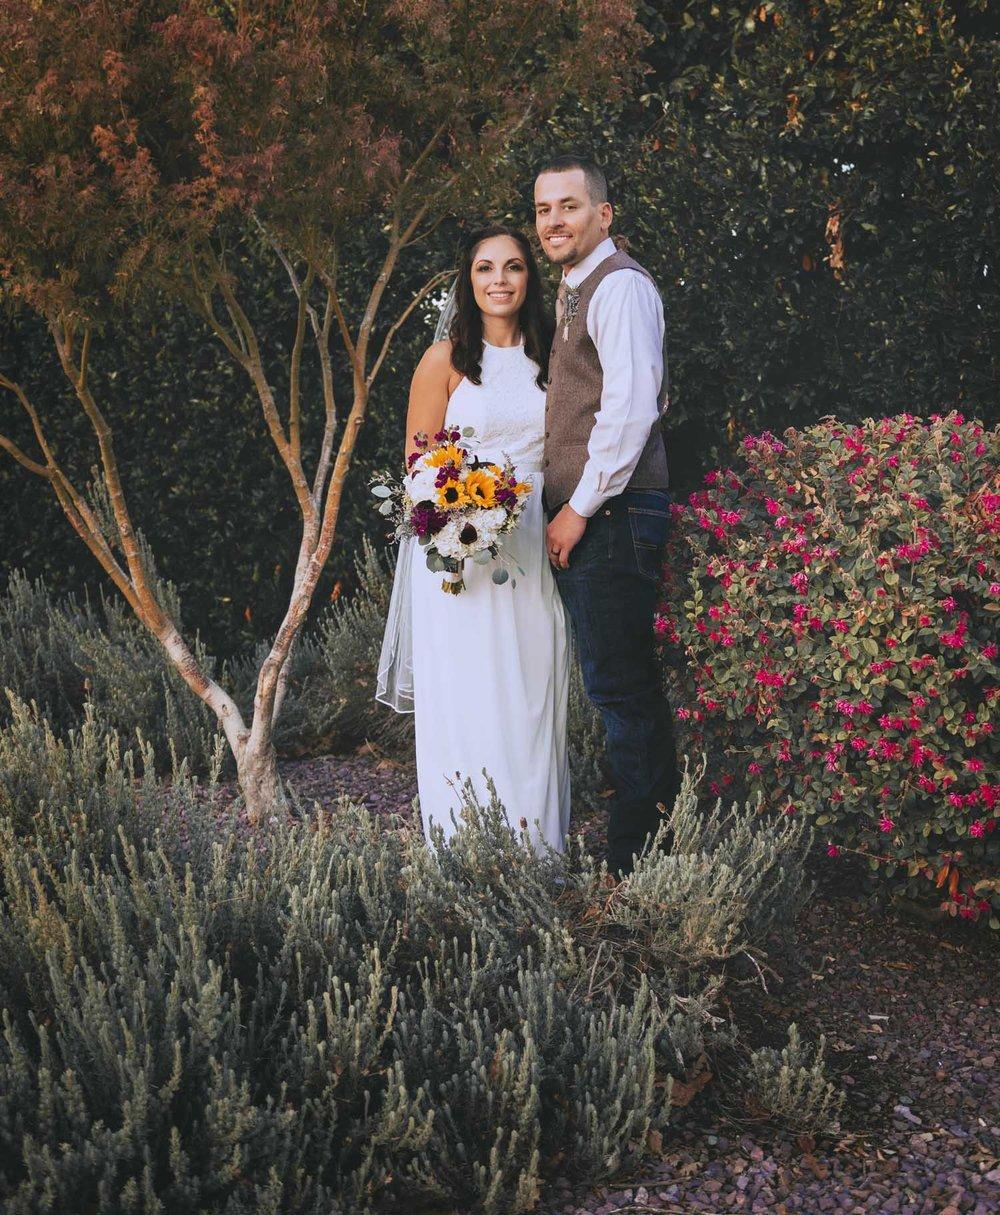 Bonnie-Scott-Rustic-Wedding-Chico-Ca-Butte-Creek-Country-Club252.jpg